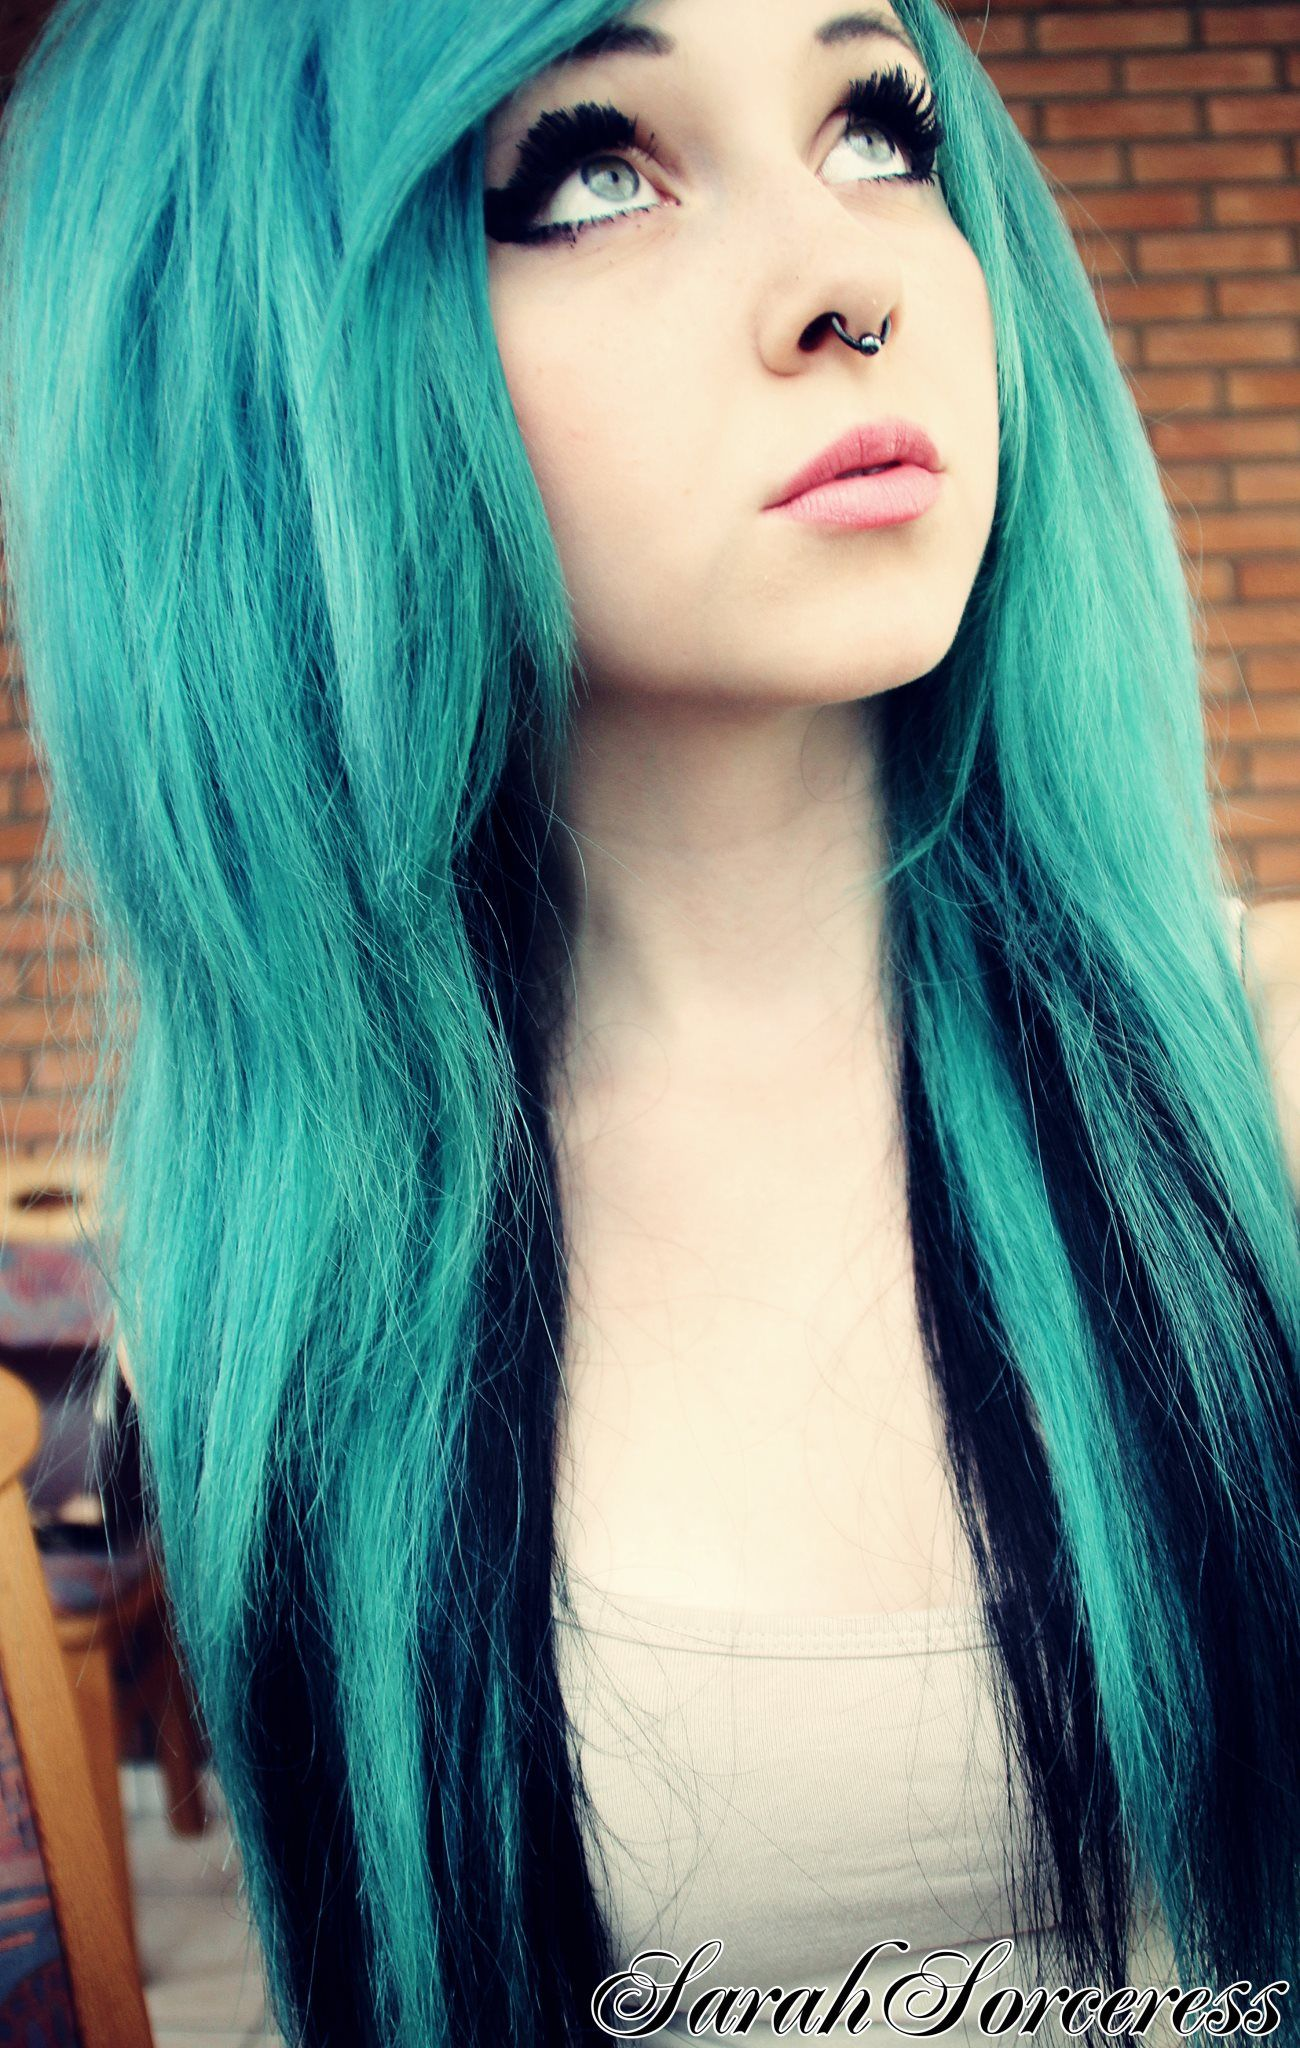 sarah sorceress | hair in 2019 | hair, emo hair, hair styles